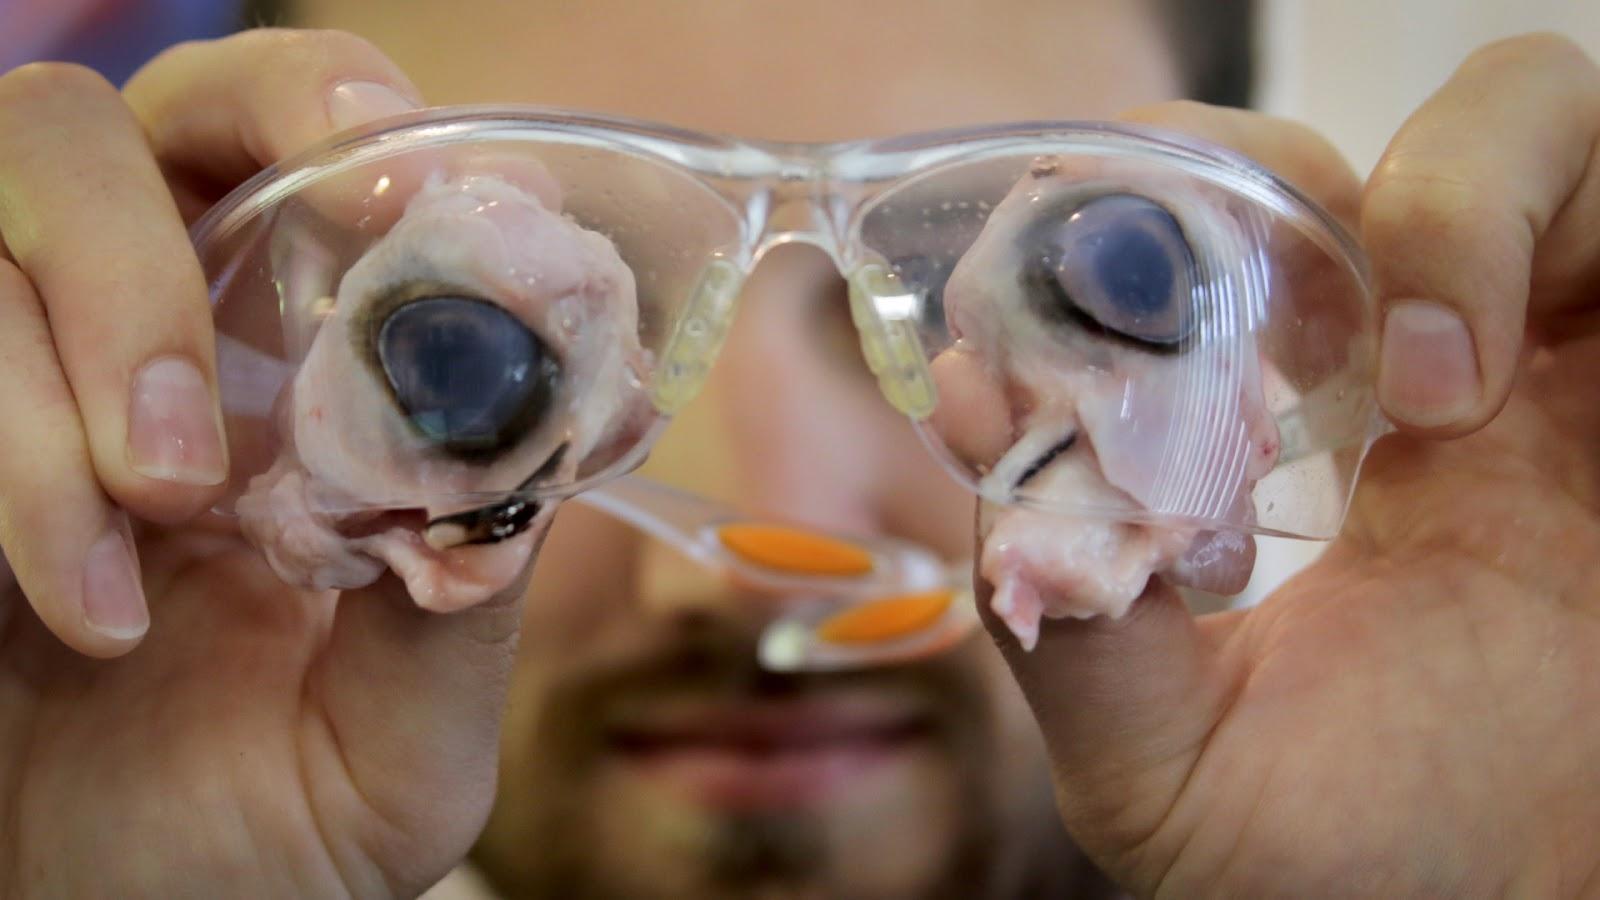 William Osman: Safety Glasses vs Laser Glasses